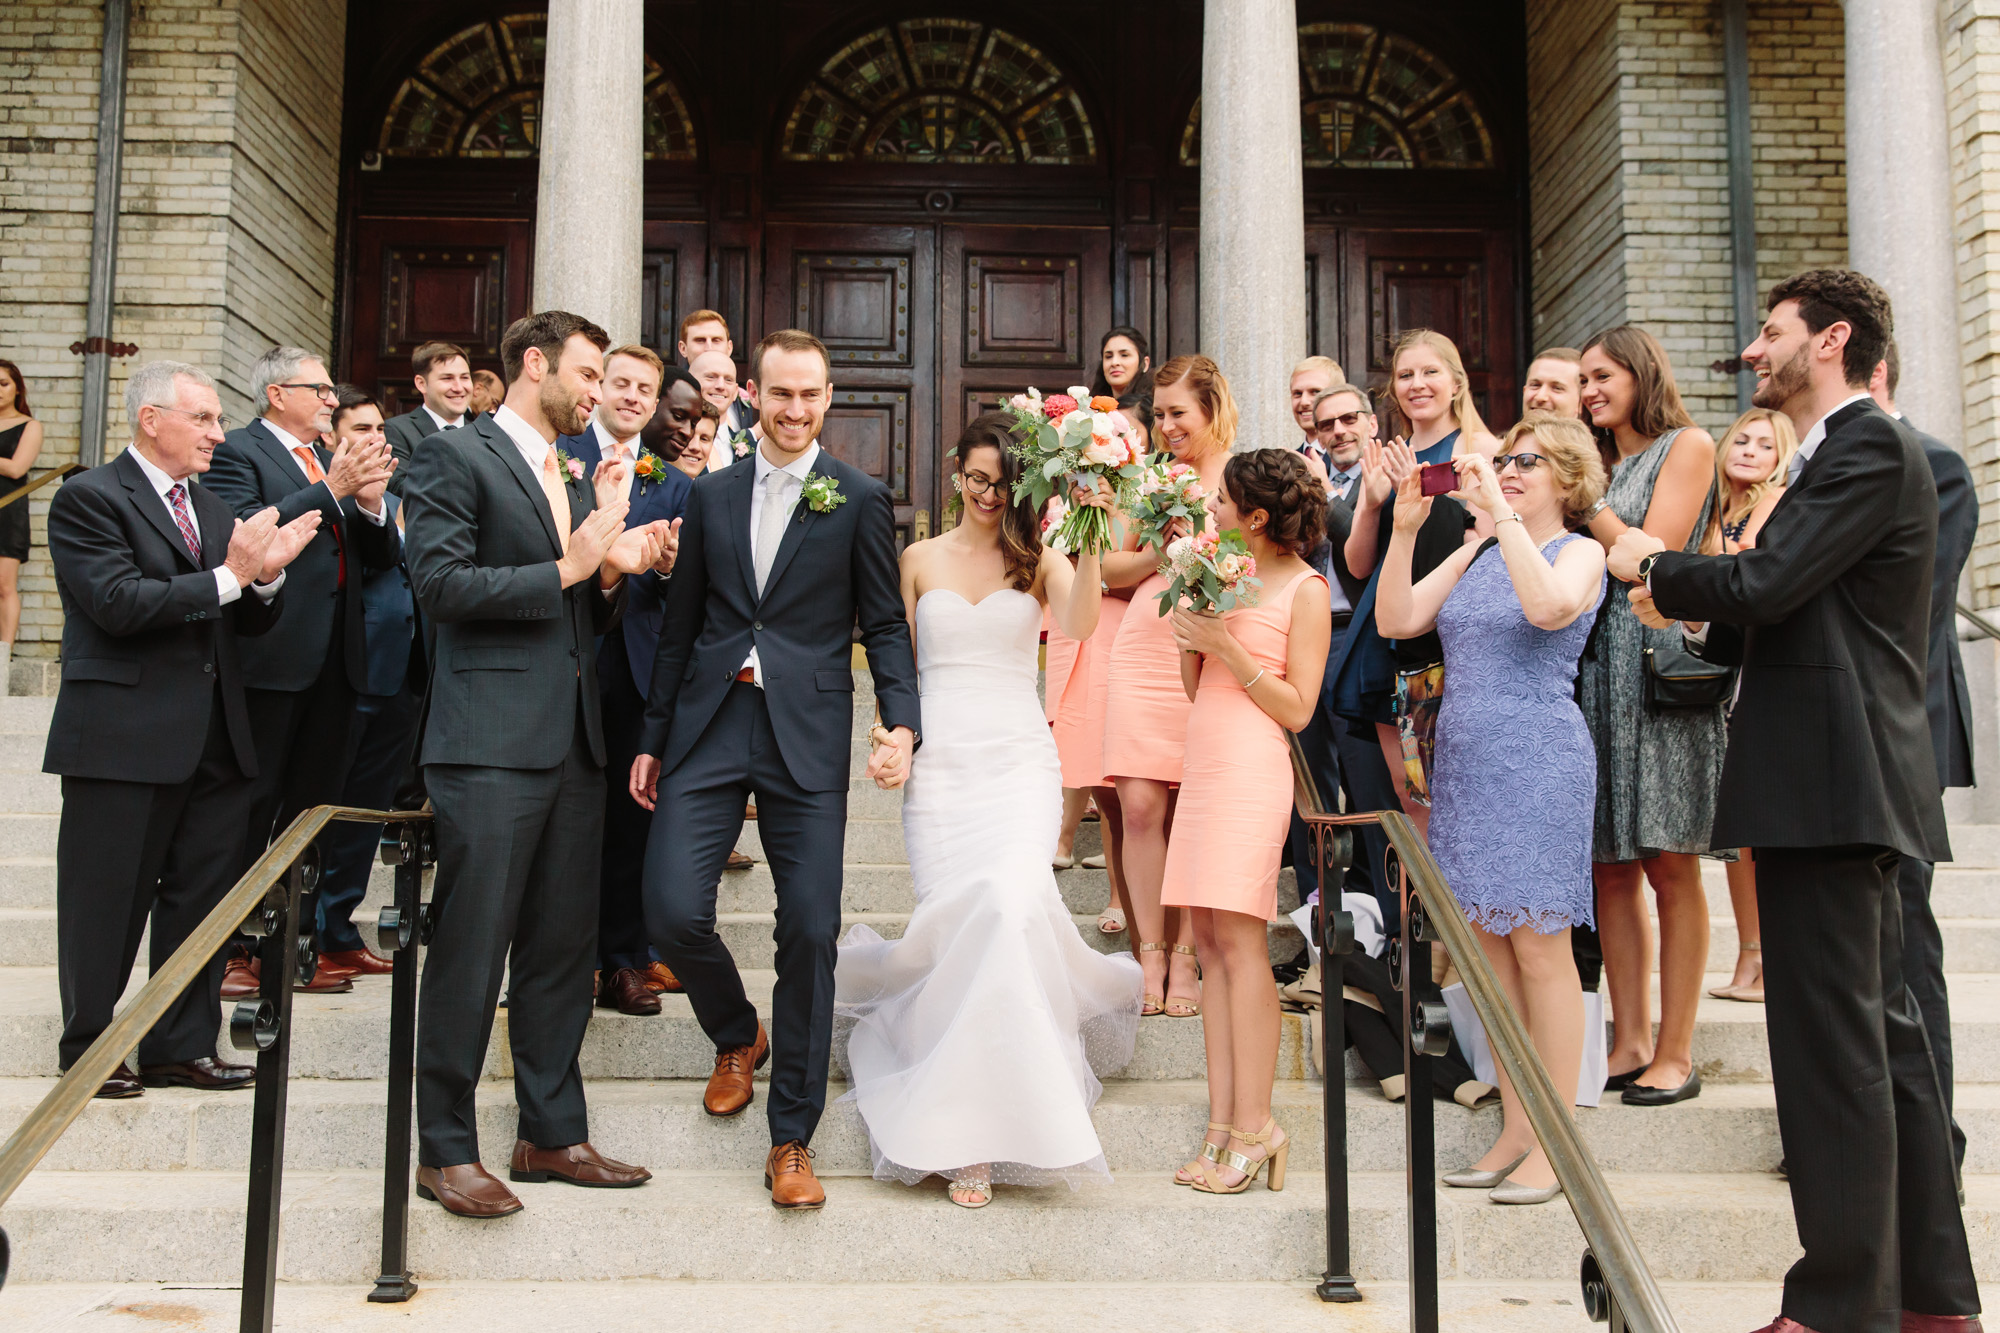 23_Kate_Sam_Picnic_House_Wedding_Brooklyn_NY_Tanya_Salazar_Photography_713.jpg